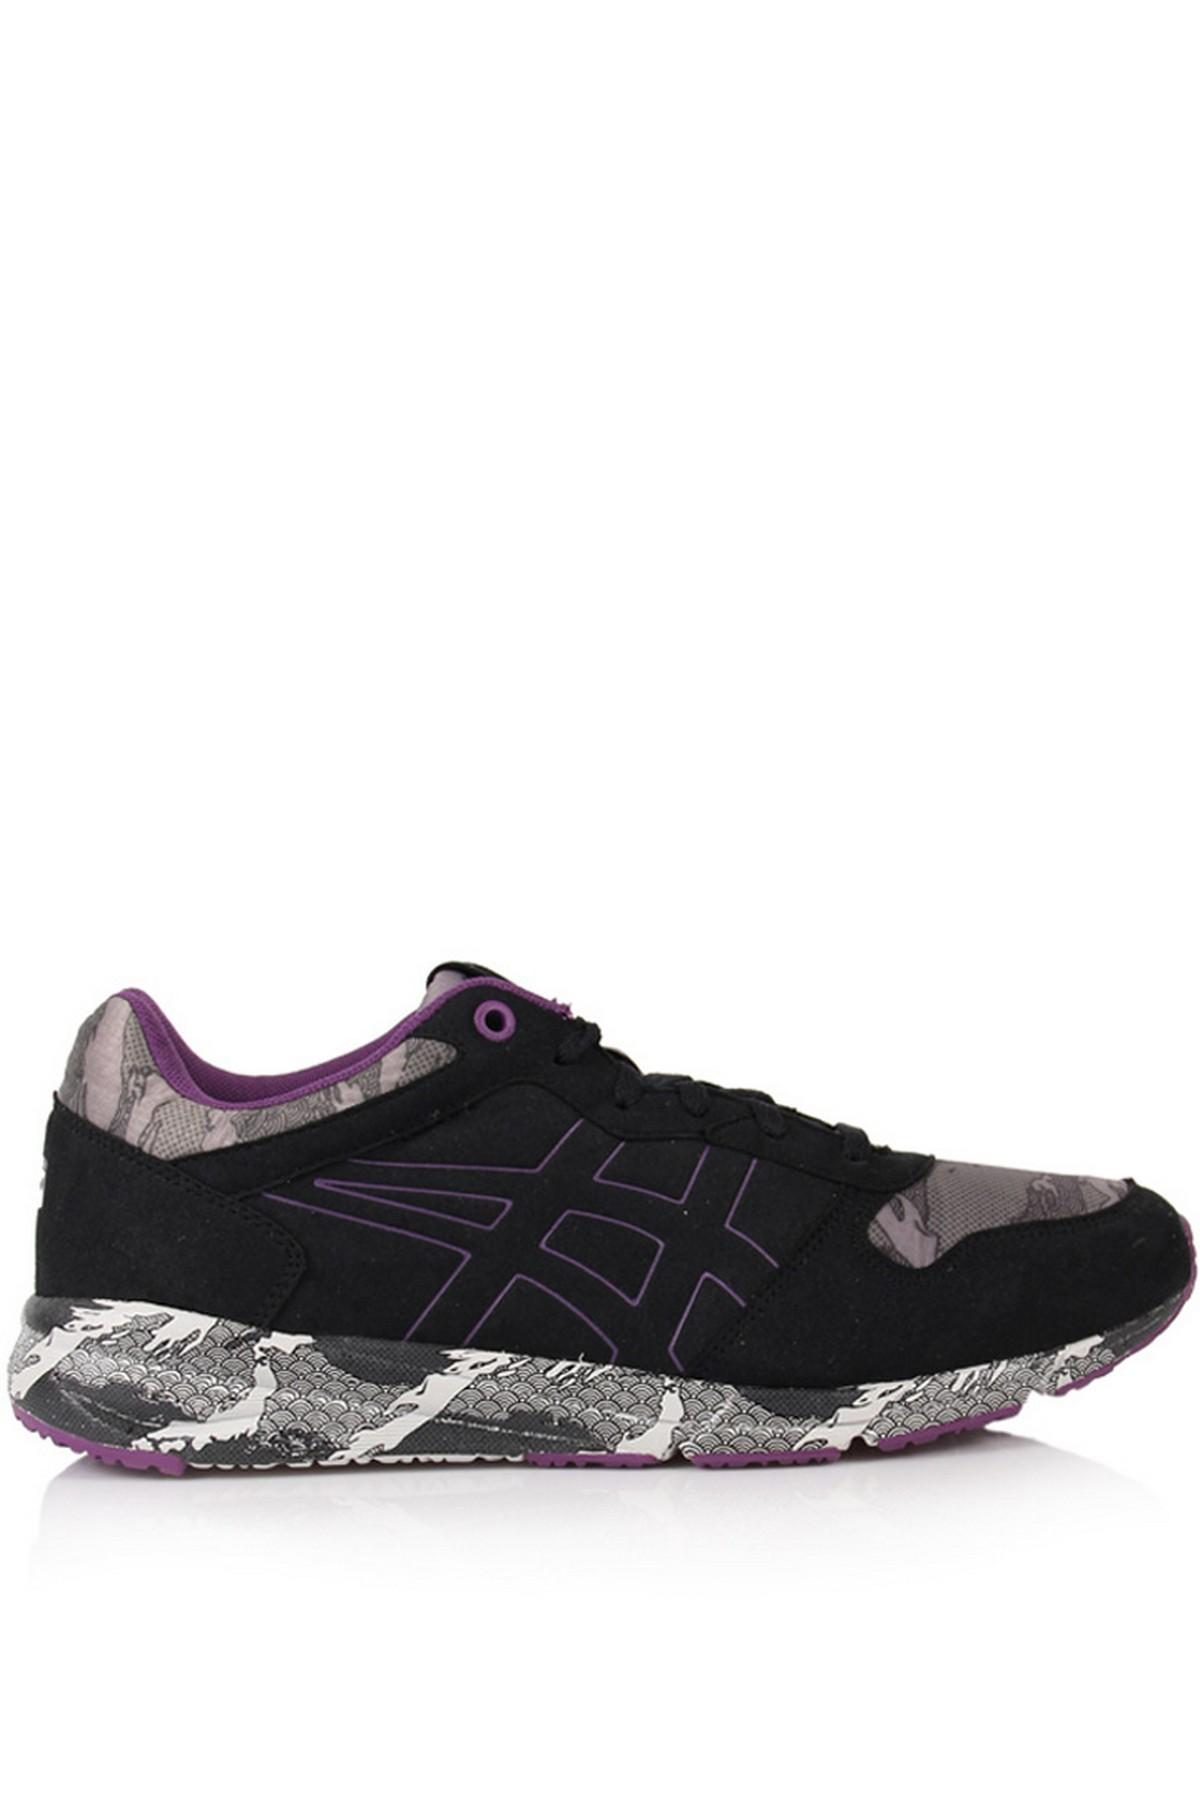 Onitsuka Tiger Kadın Spor Ayakkabı Siyah (D417Y-9033)